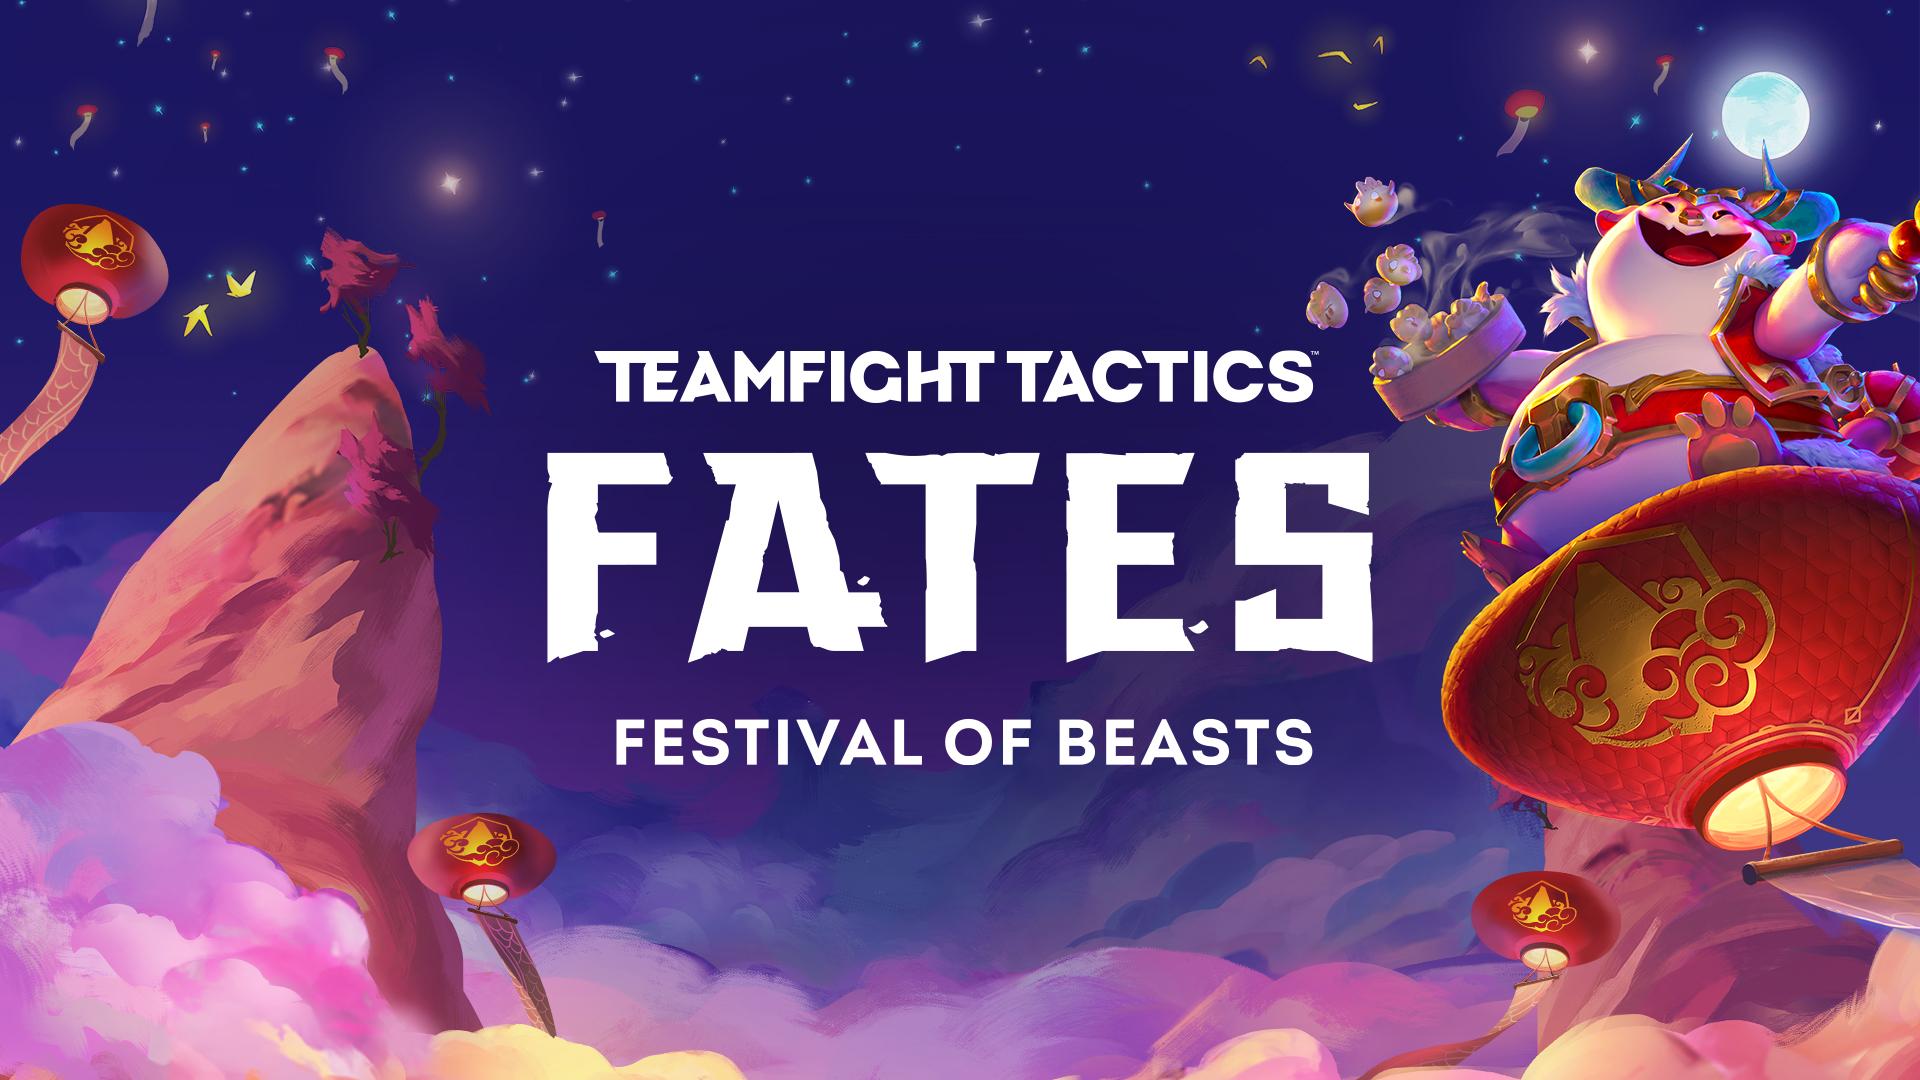 TFT Fates Festival of Beasts header